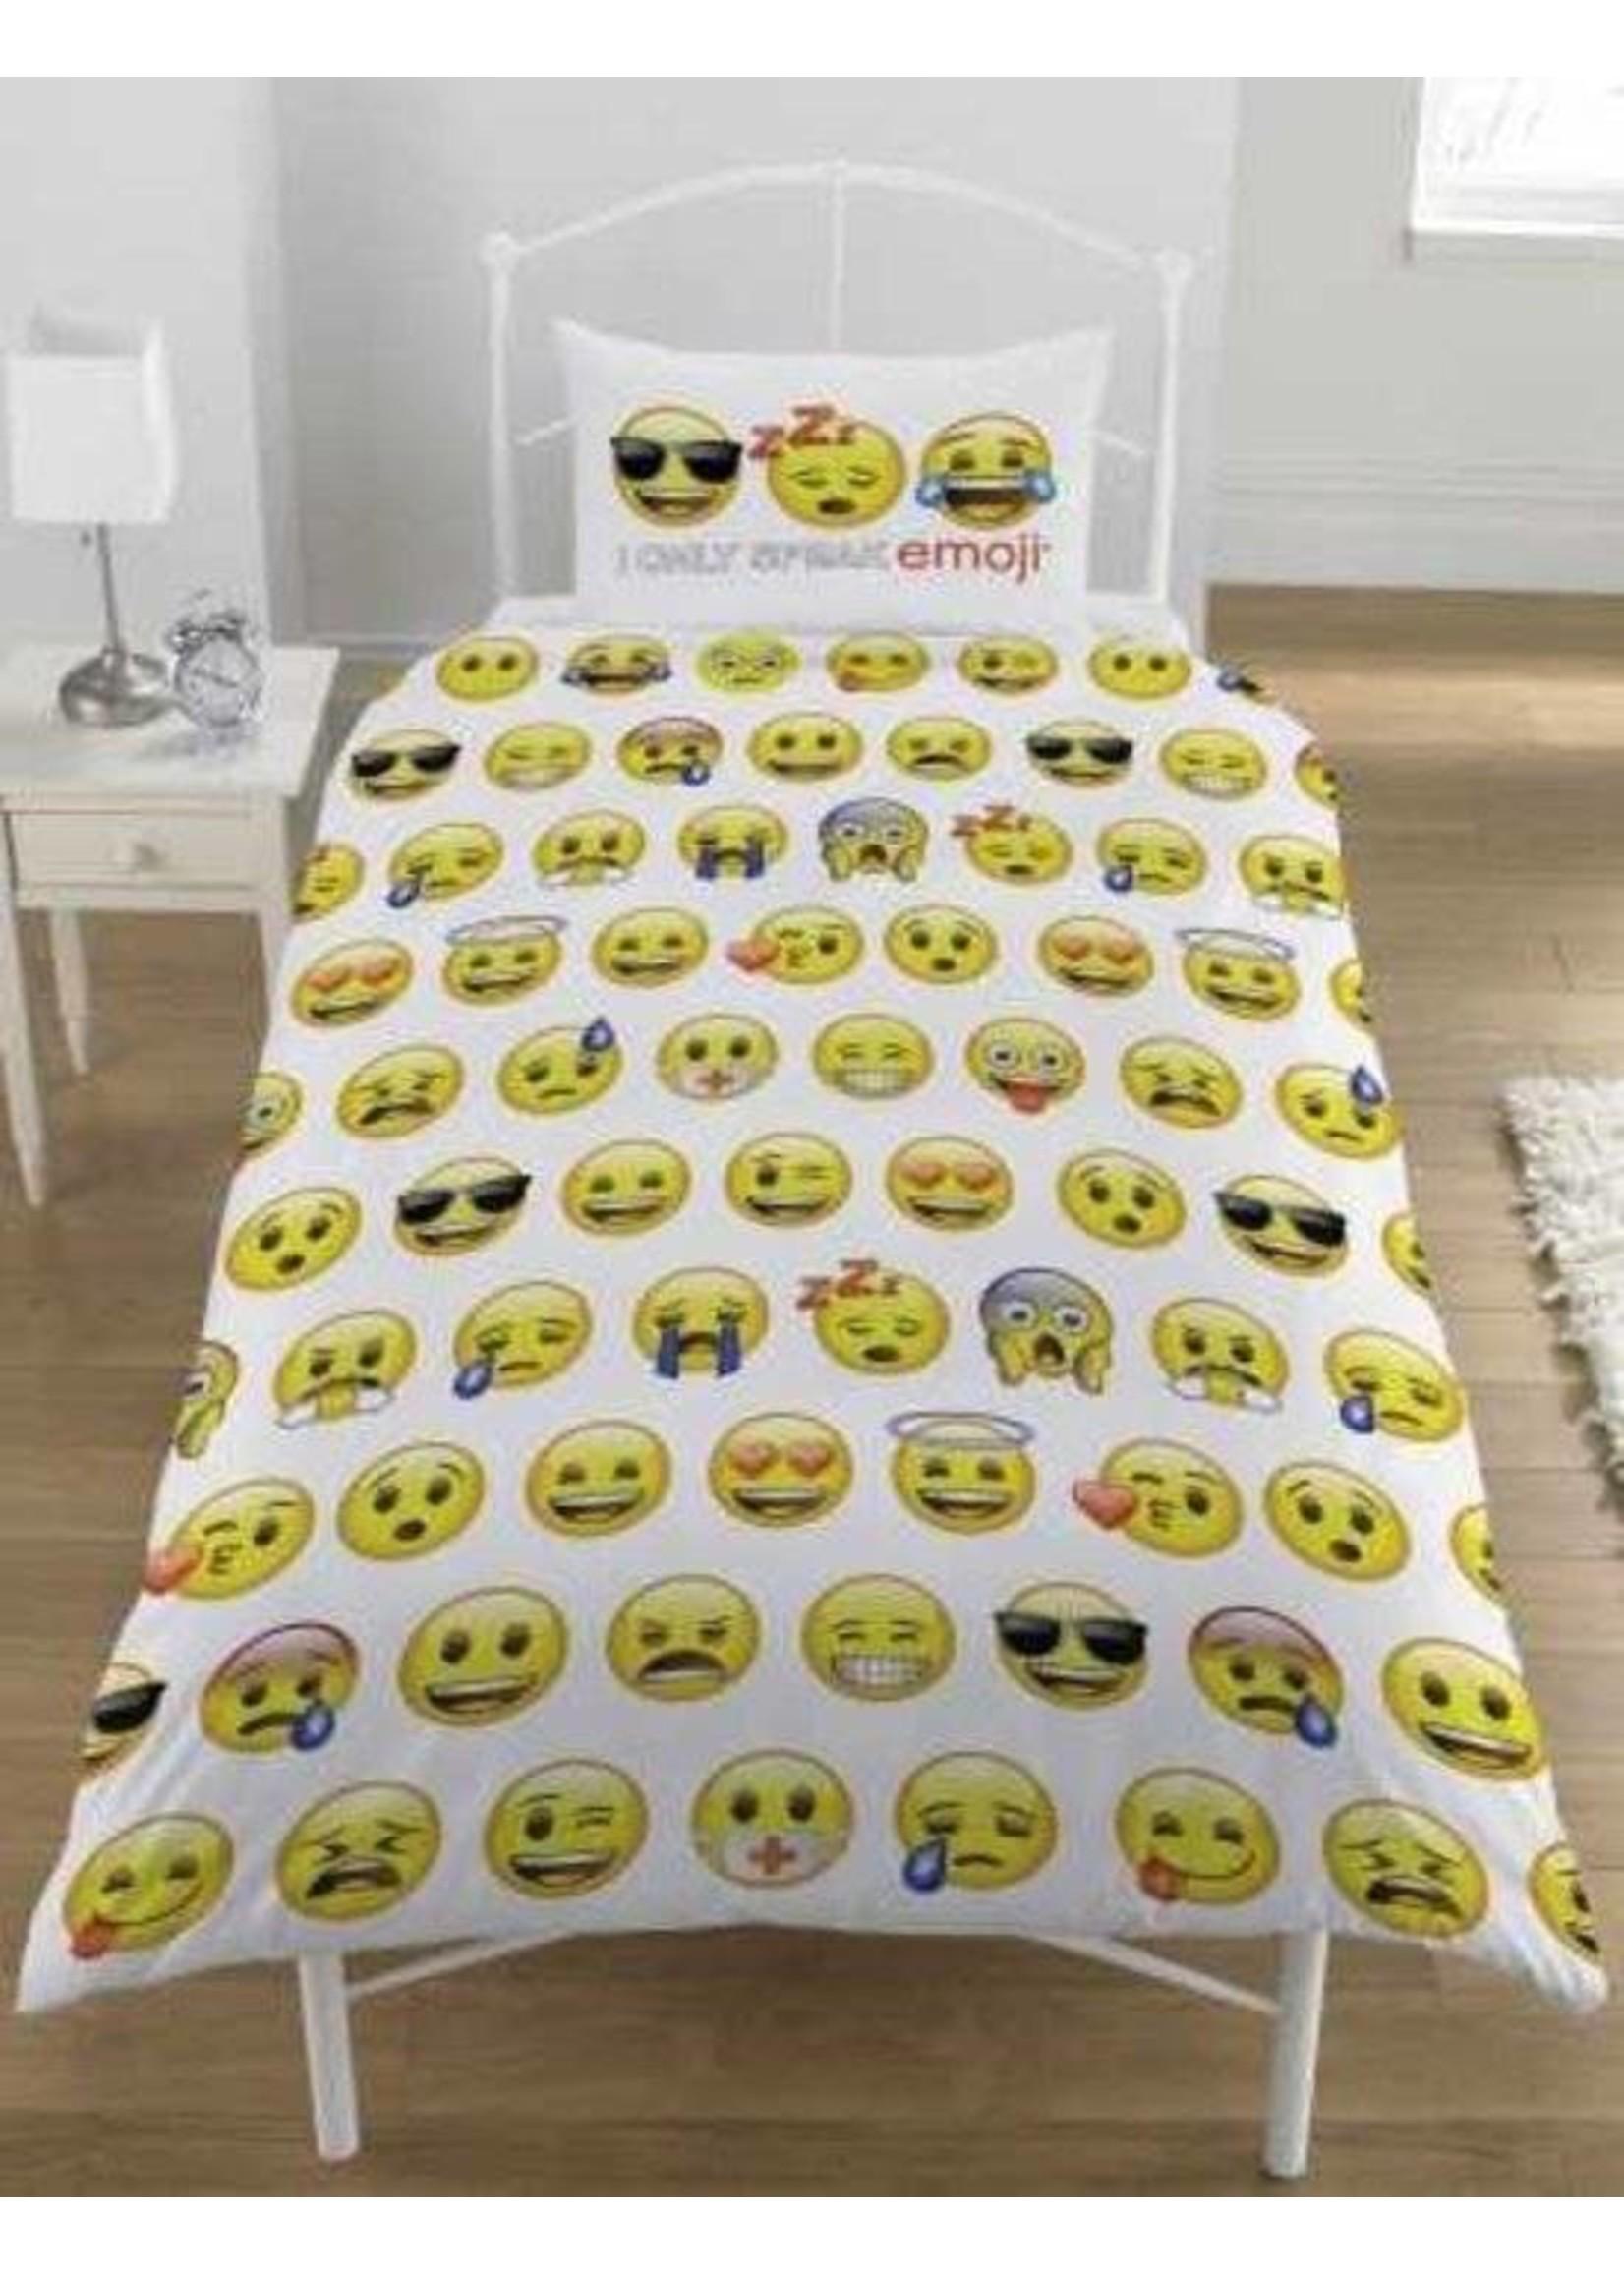 Emoji Emoji Smiley Dekbedovertrek